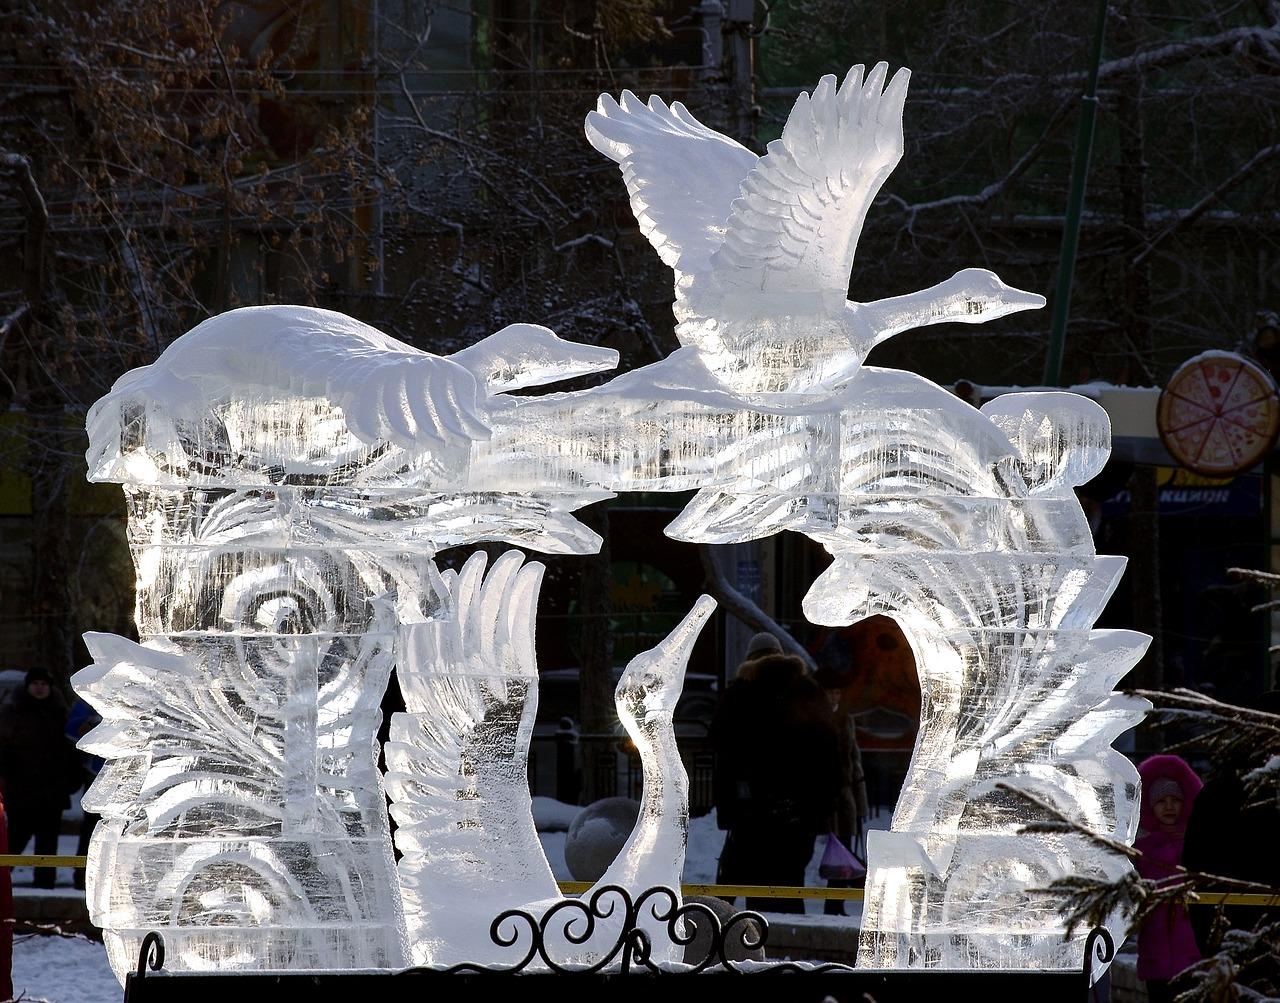 The Best Winter Events Near Hillsborough Township, NJ